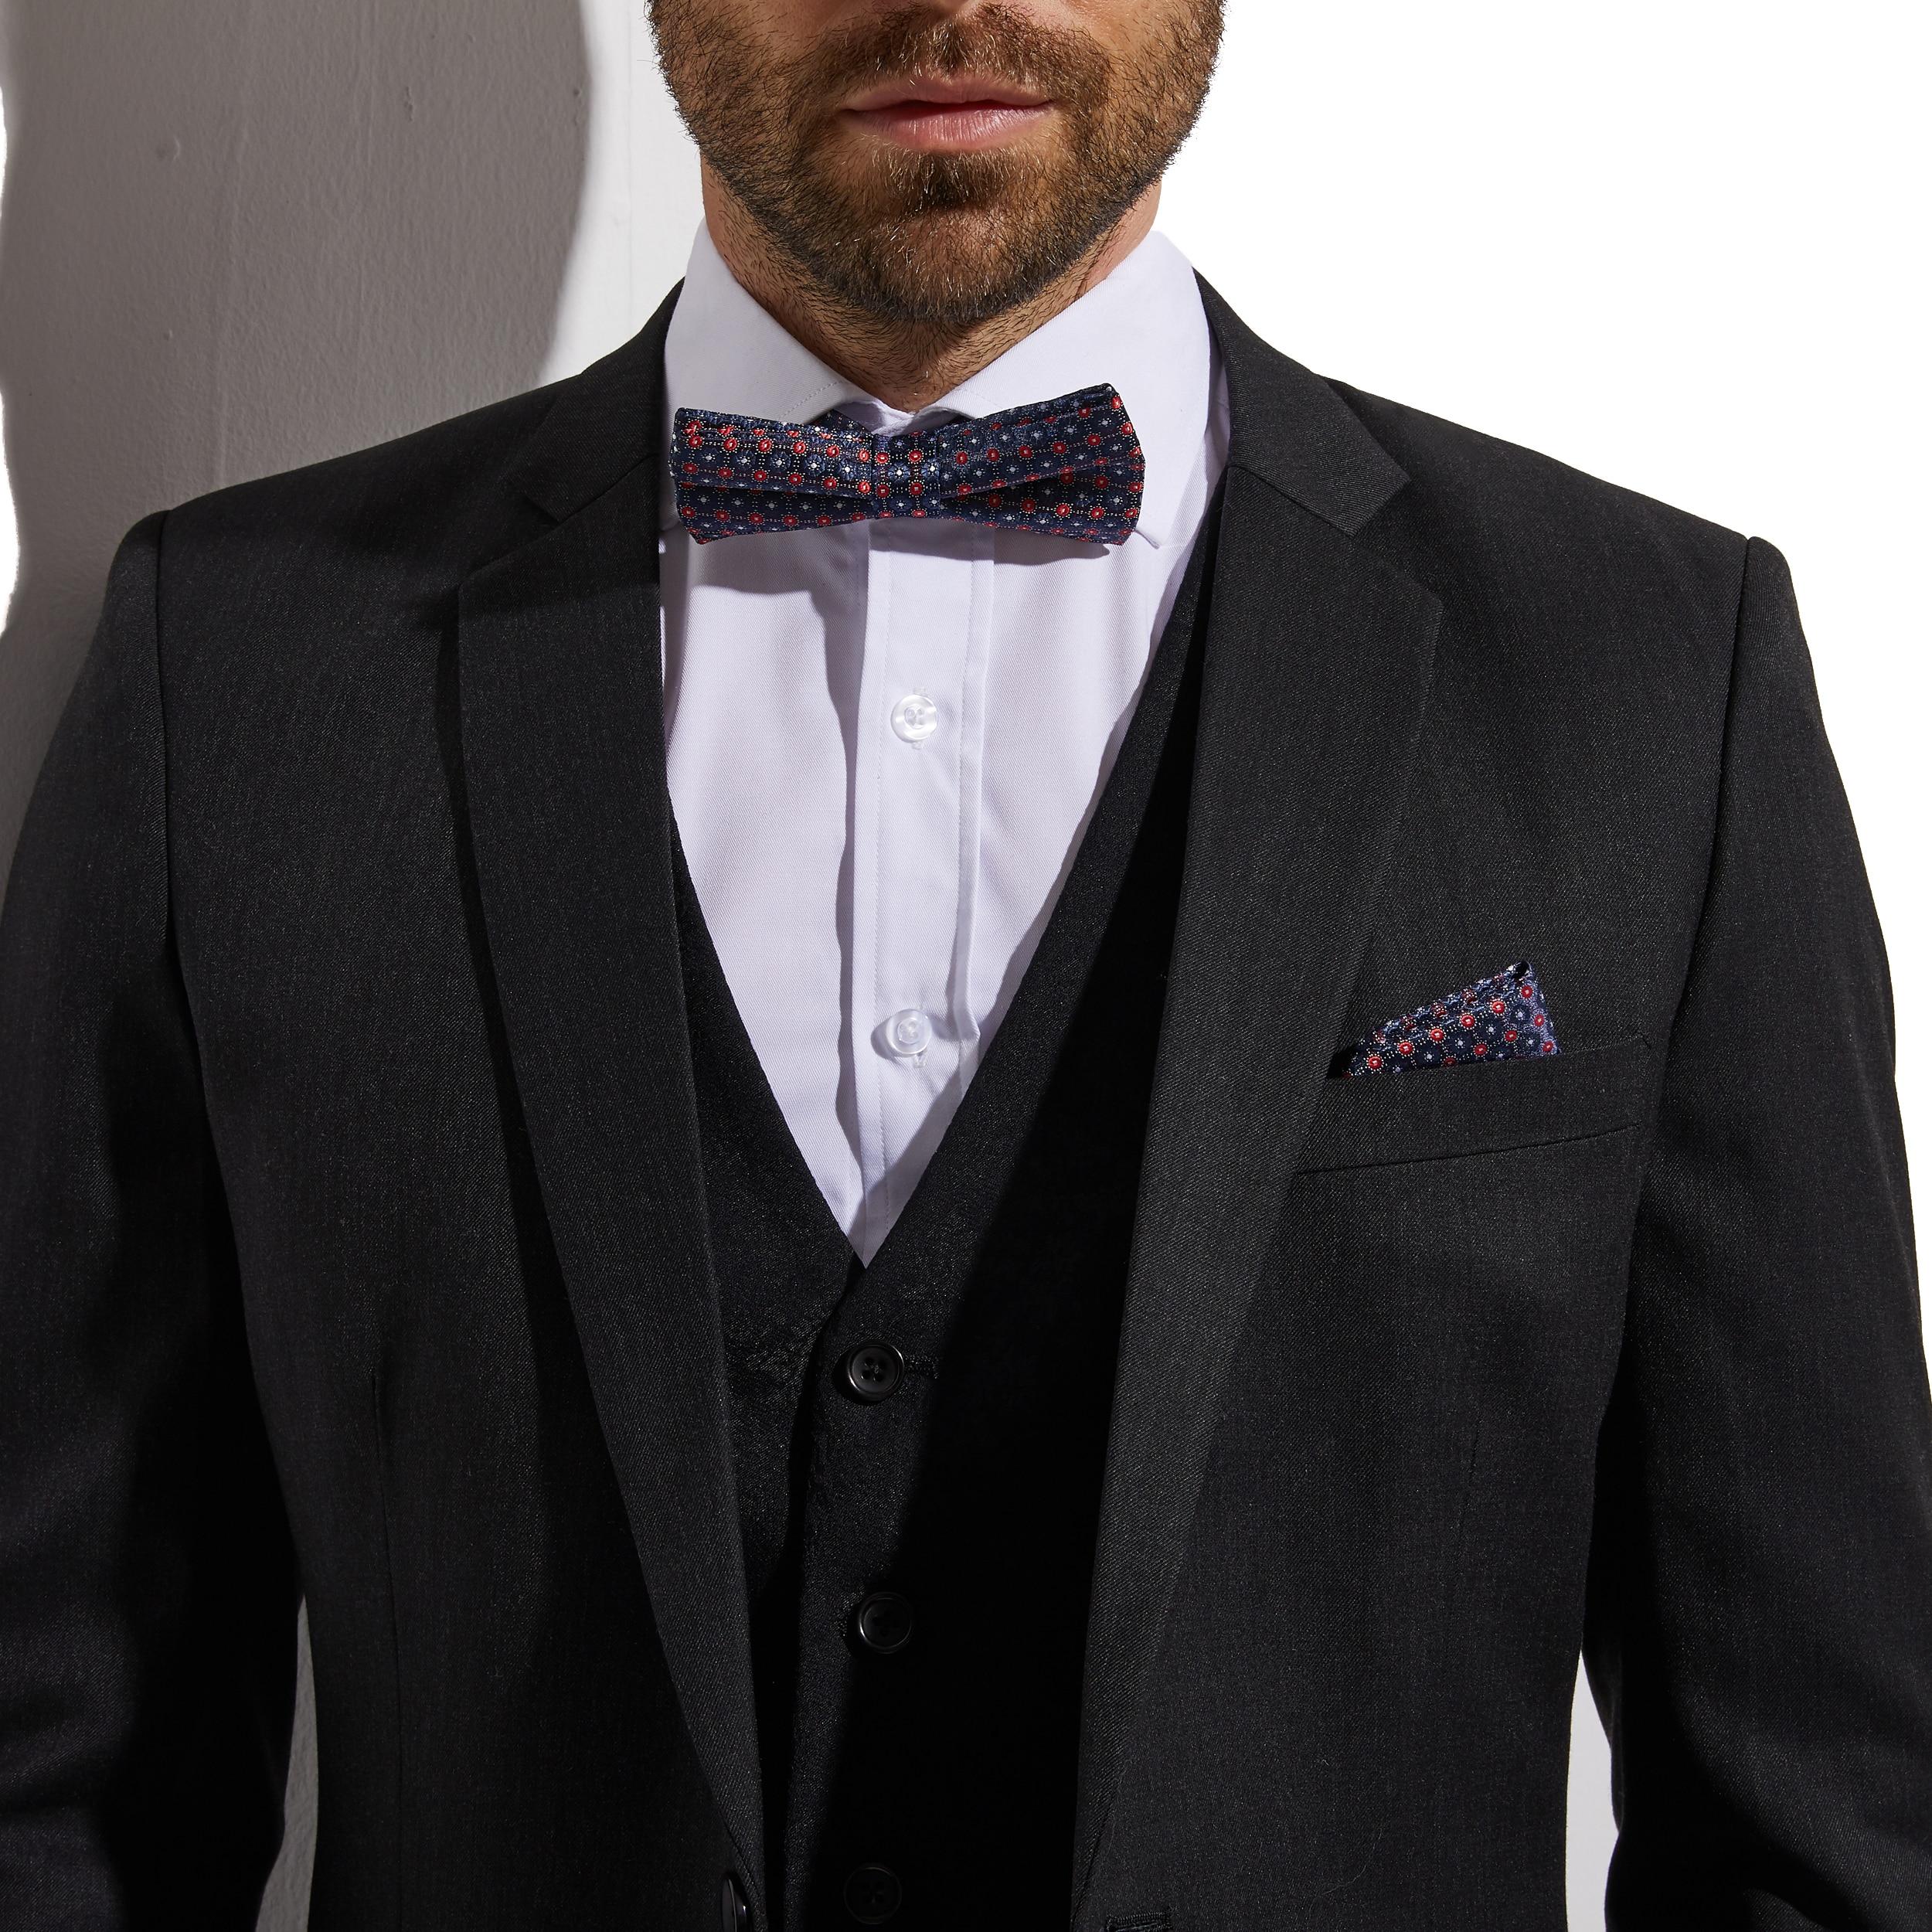 2020 Slim Fit Dark Charcoal Grey Groom Suit With Jacquard Vest Custom Made 3 piece Wedding Suits For Men  Wedding Groom Tuxedo 5